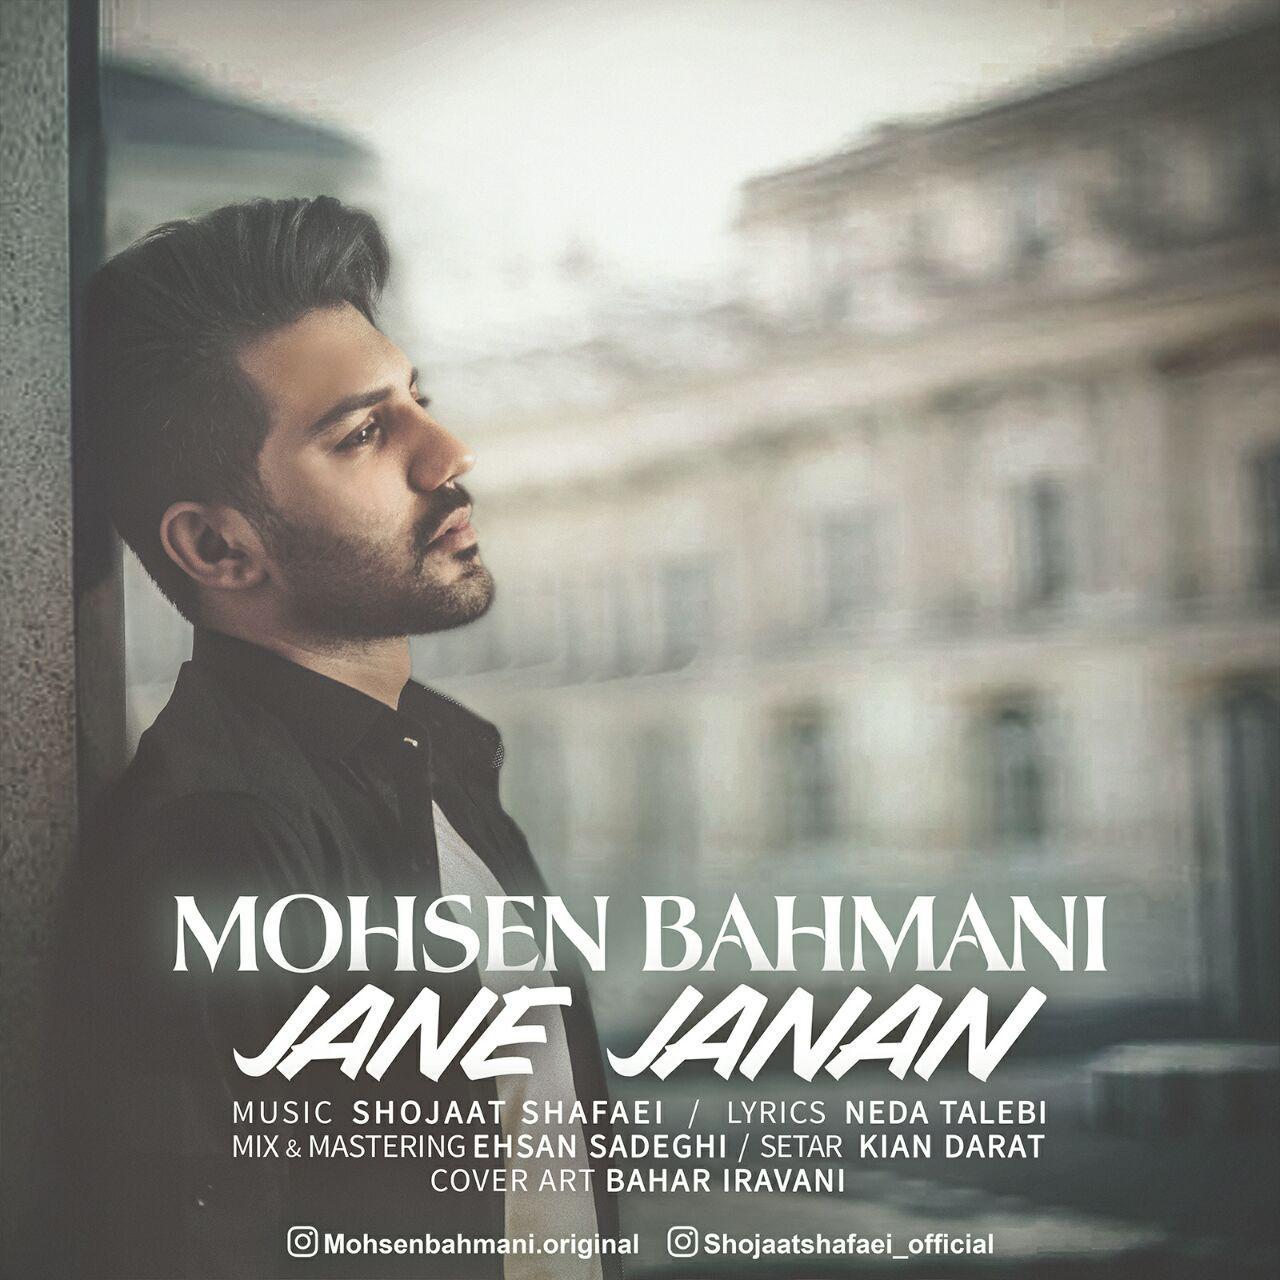 Mohsen Bahmani - Jane Janan